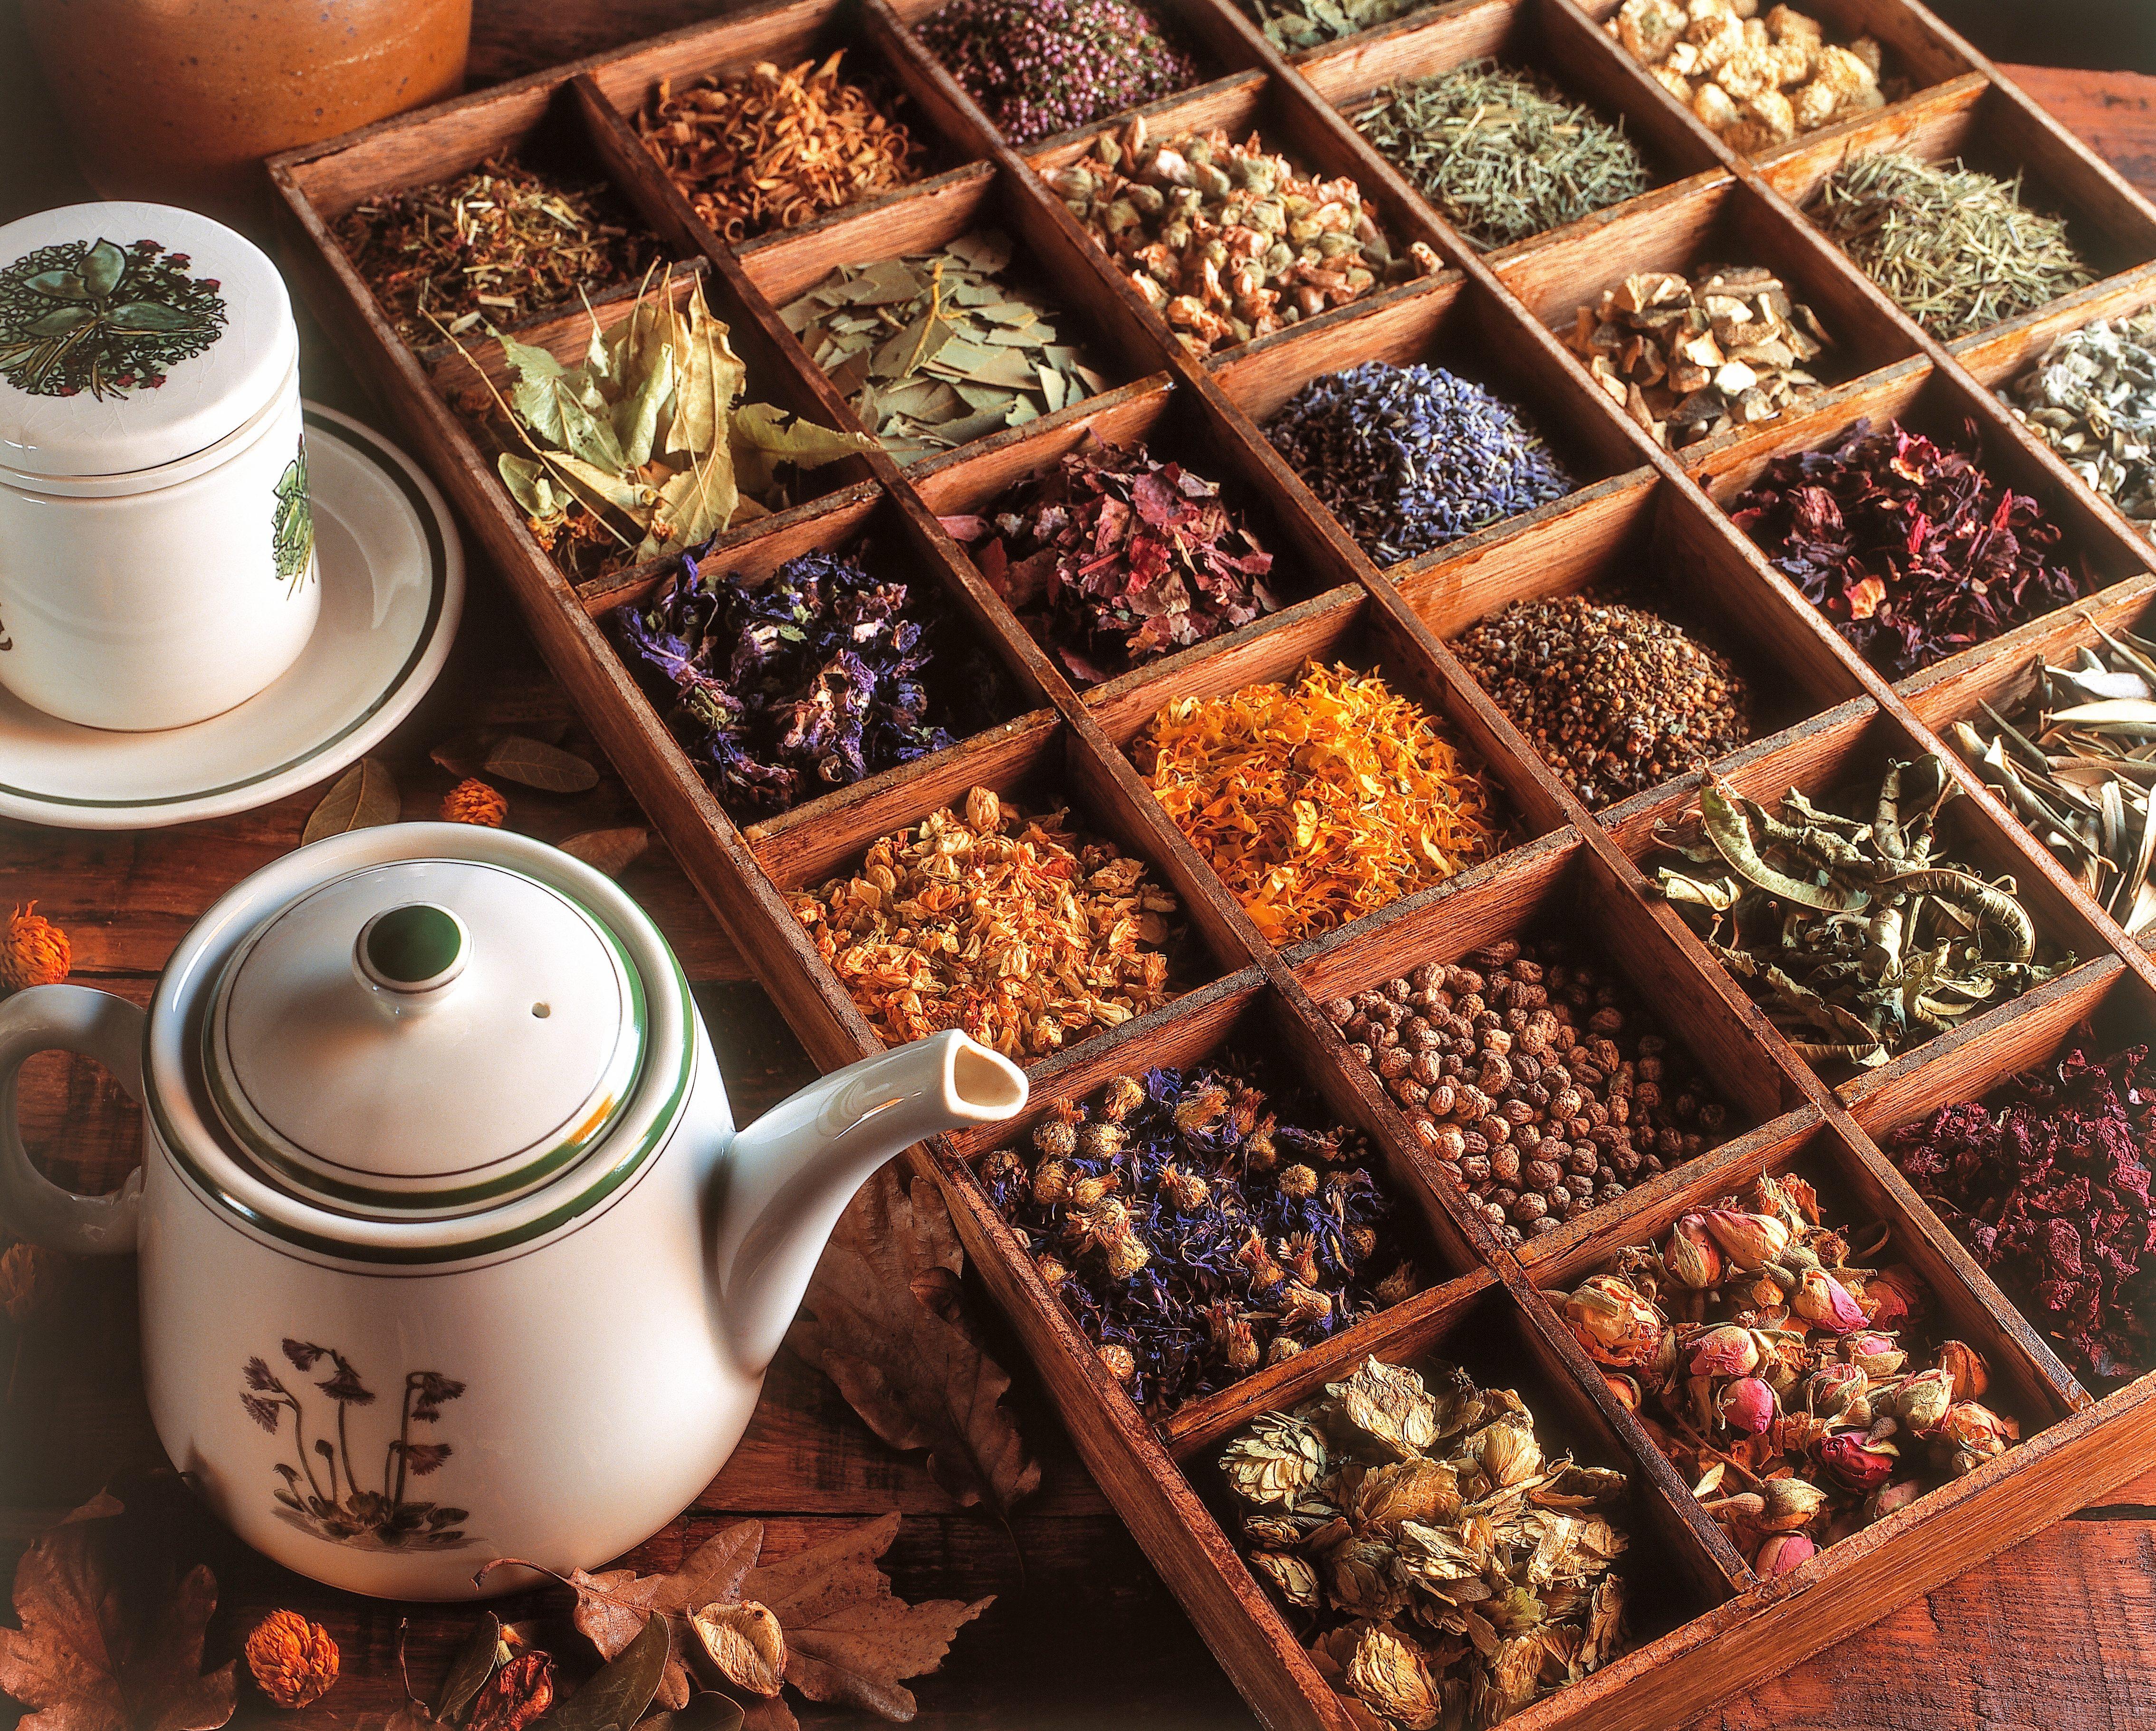 Tisane digestive: 9 tisane che ti aiutano a smaltire meglio pranzi e cene